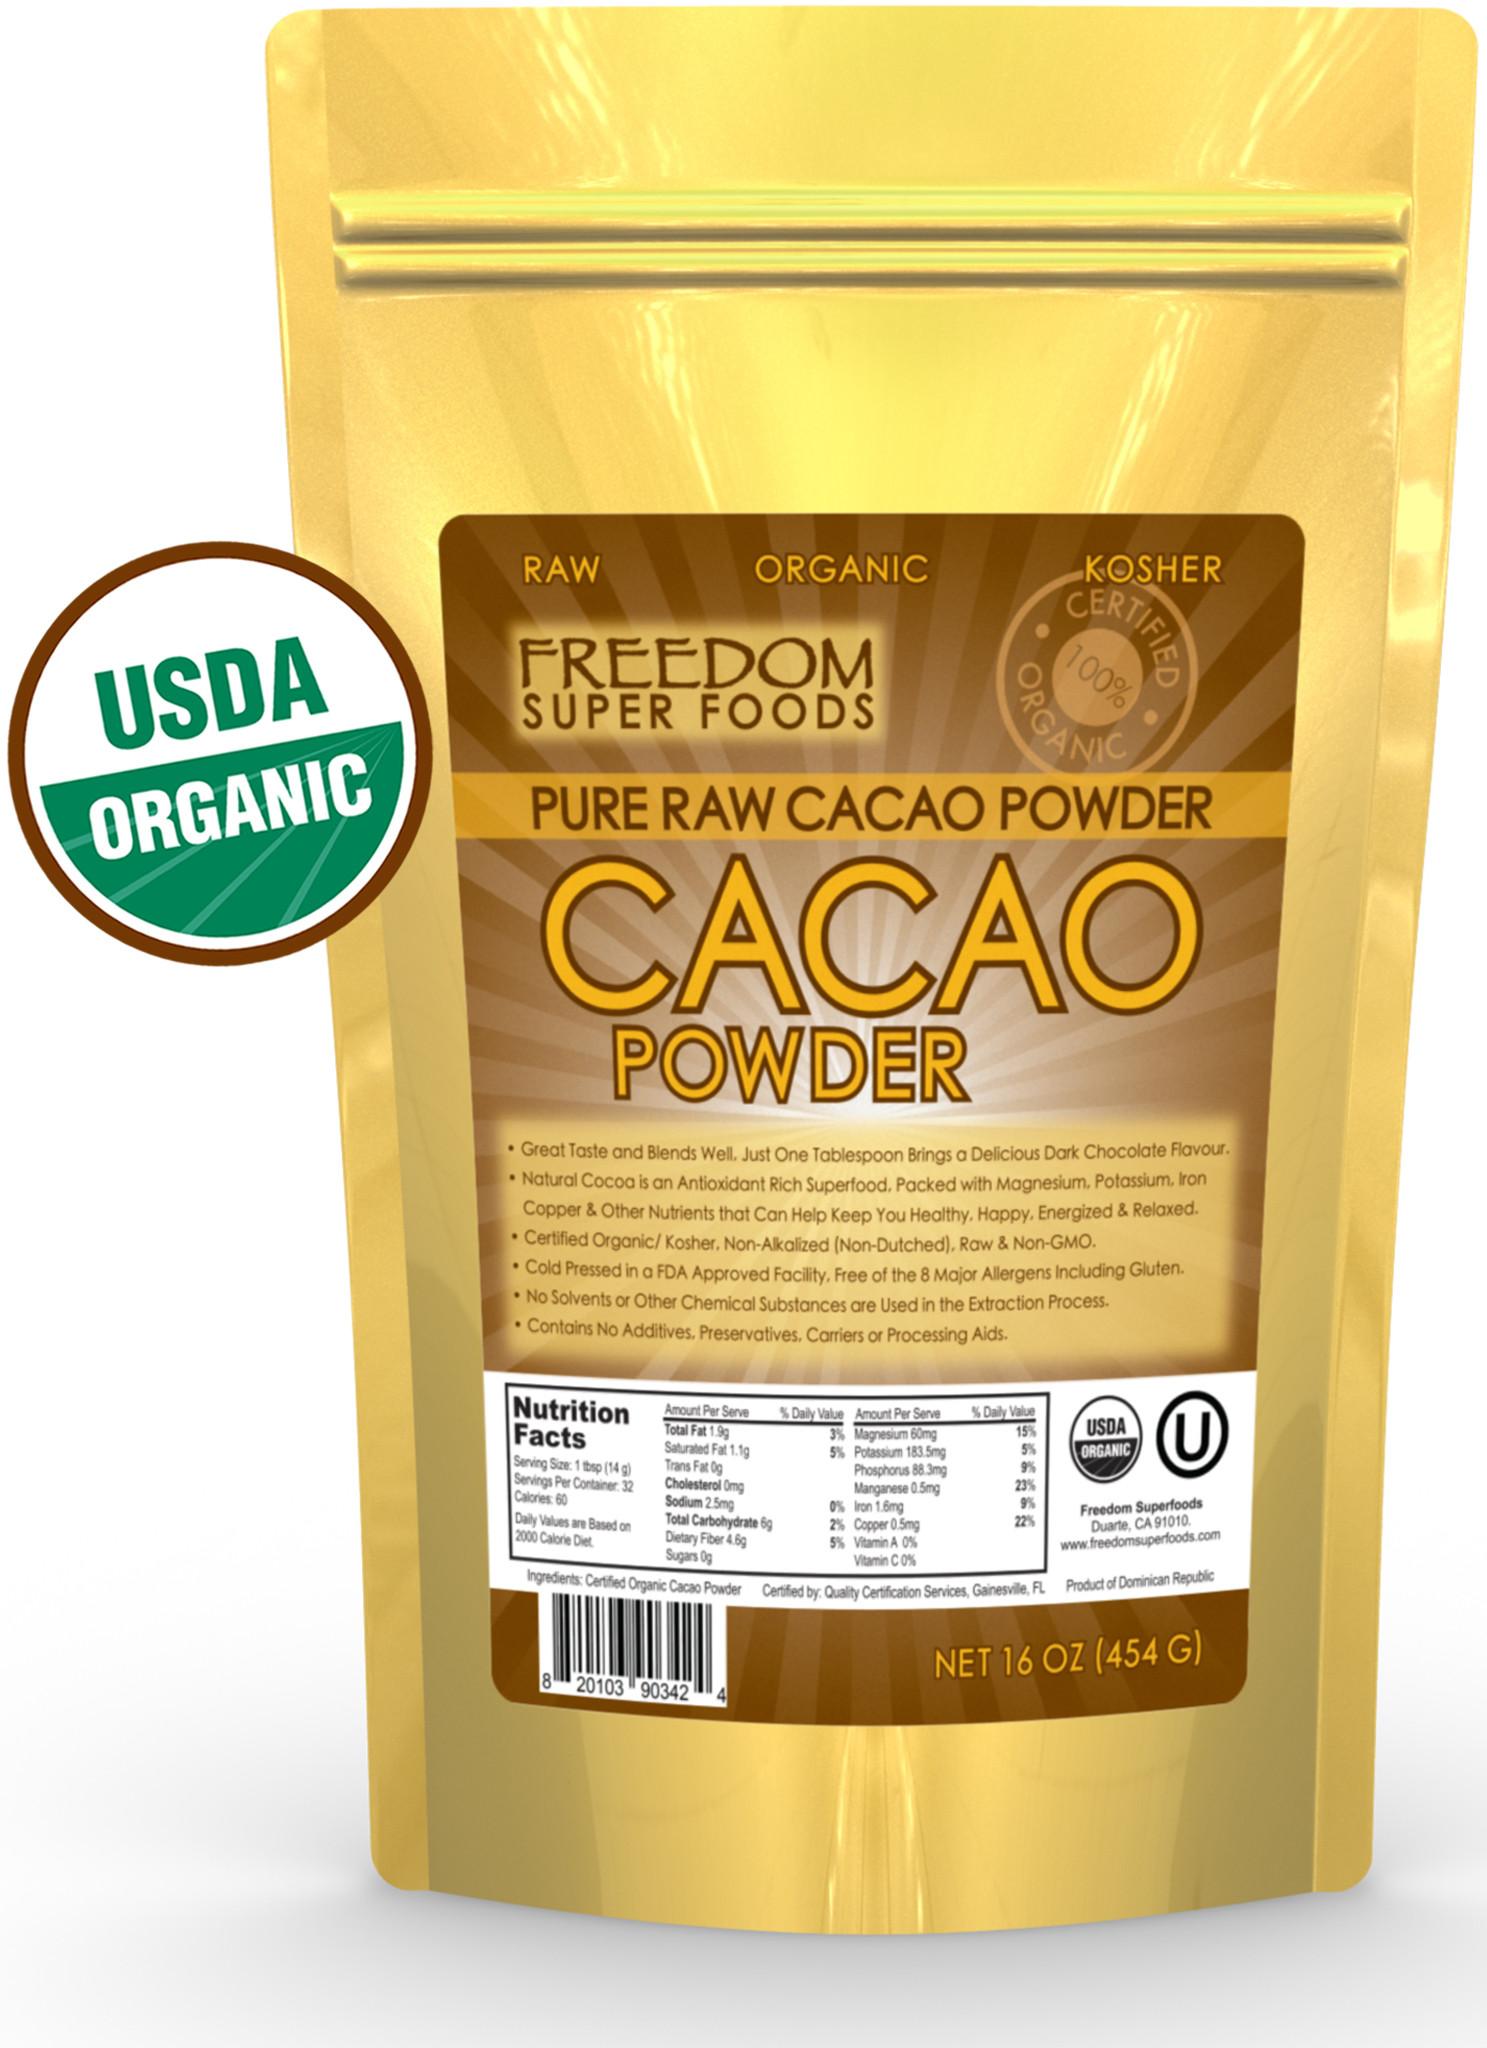 Raw Organic Cocoa Powder  Cassandra M s Place Organic Raw Cacao Powder Review